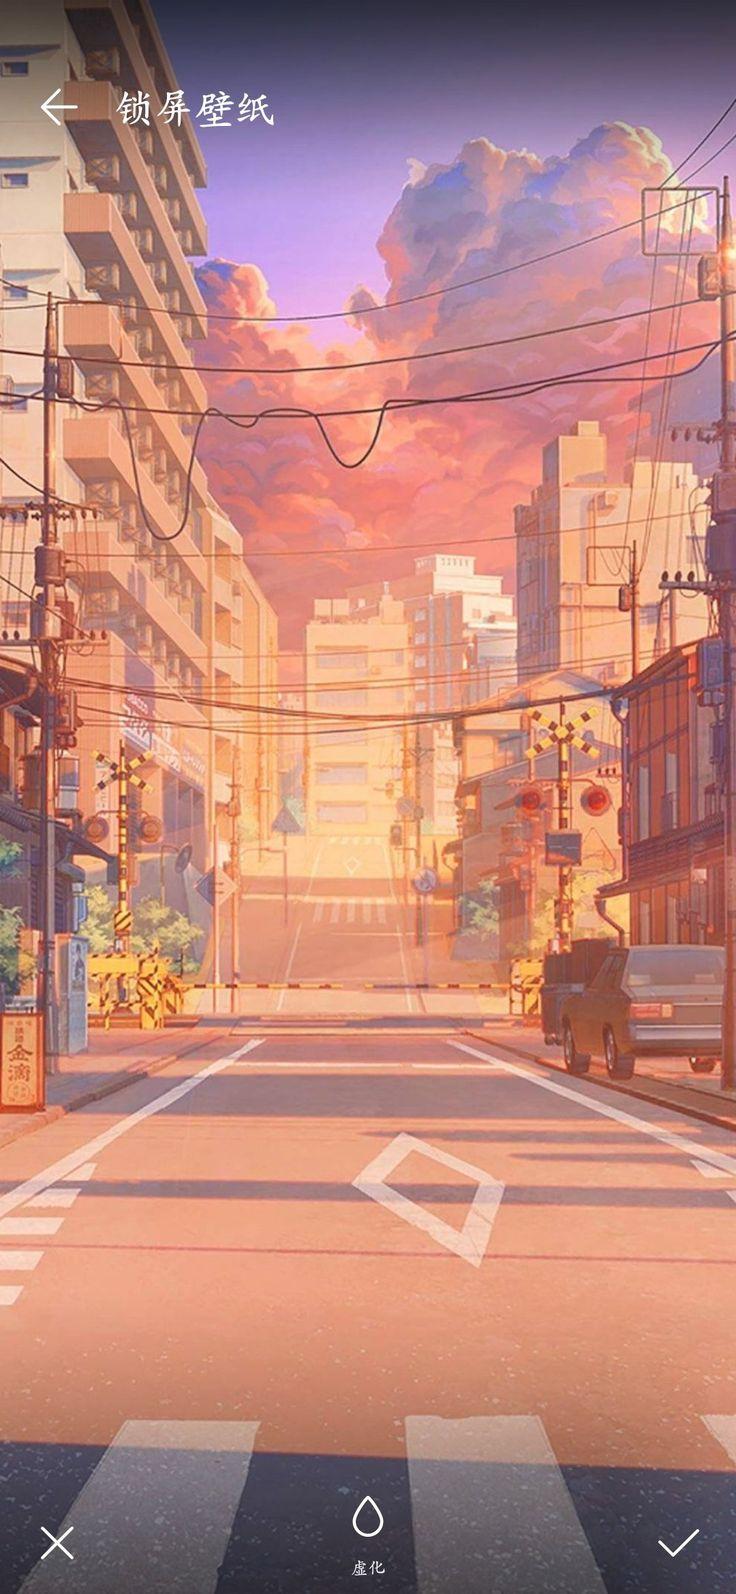 Pin oleh Hạ Vũ di • Illustration • Pemandangan anime